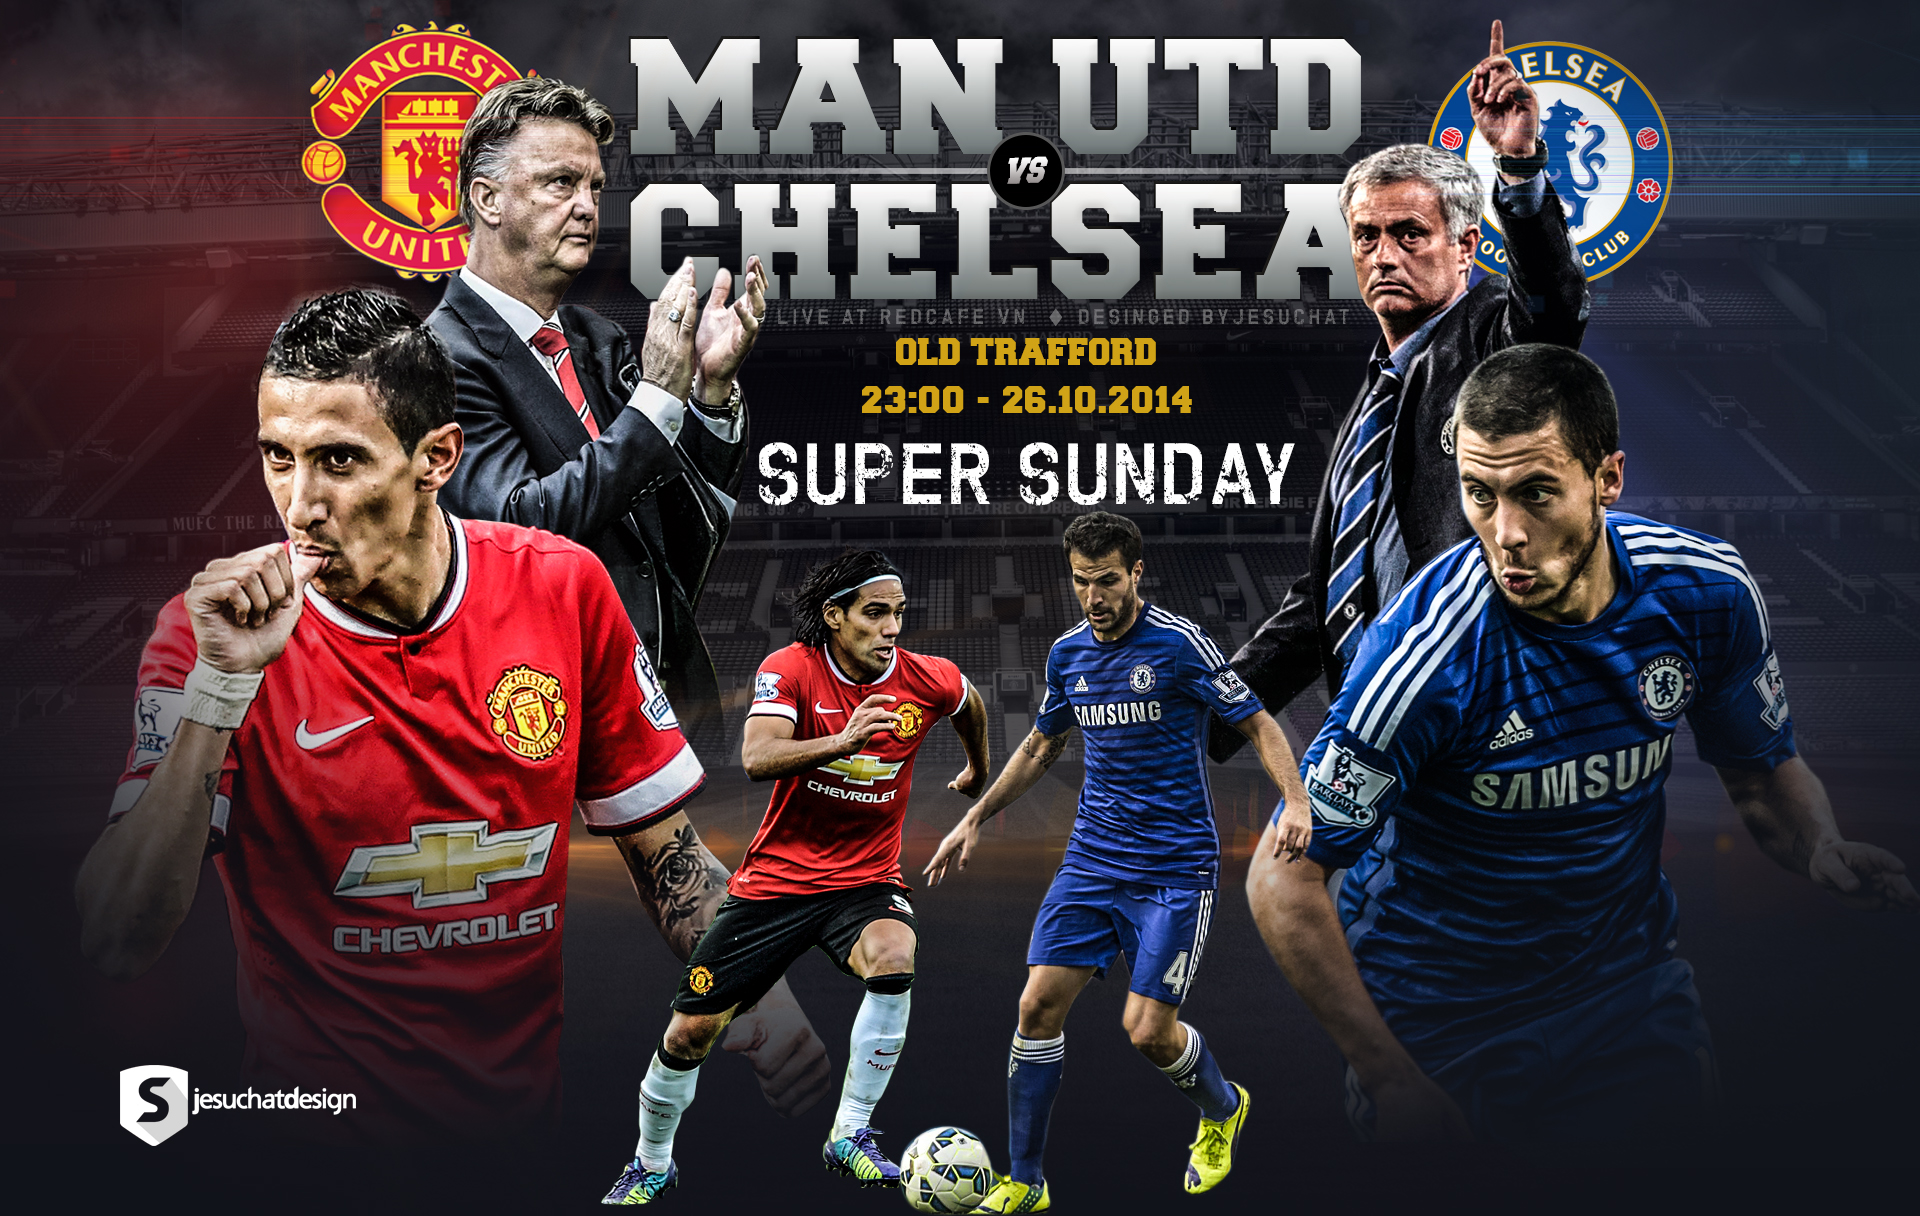 Man U Vs Chelsea: Man Utd V Chelsea By Jesuchat On DeviantArt